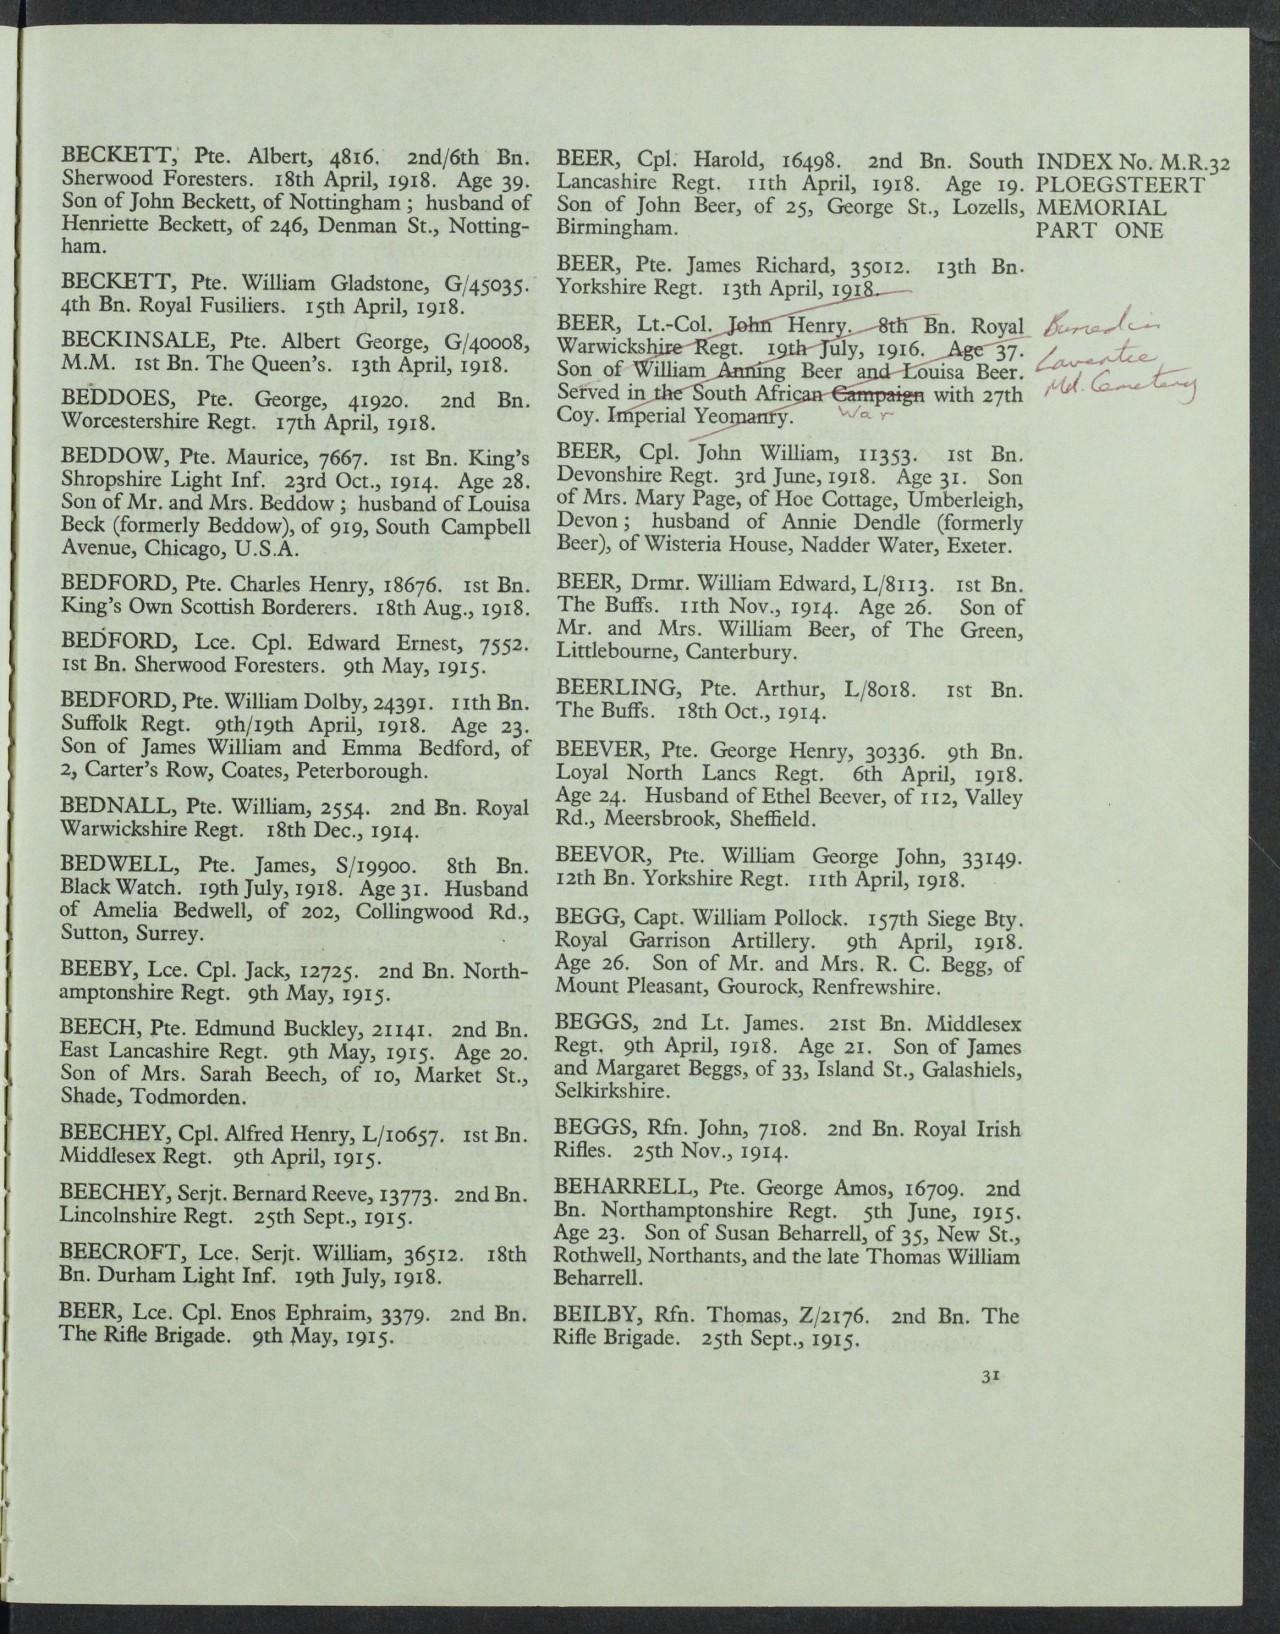 BEER CWGC grave register.JPG